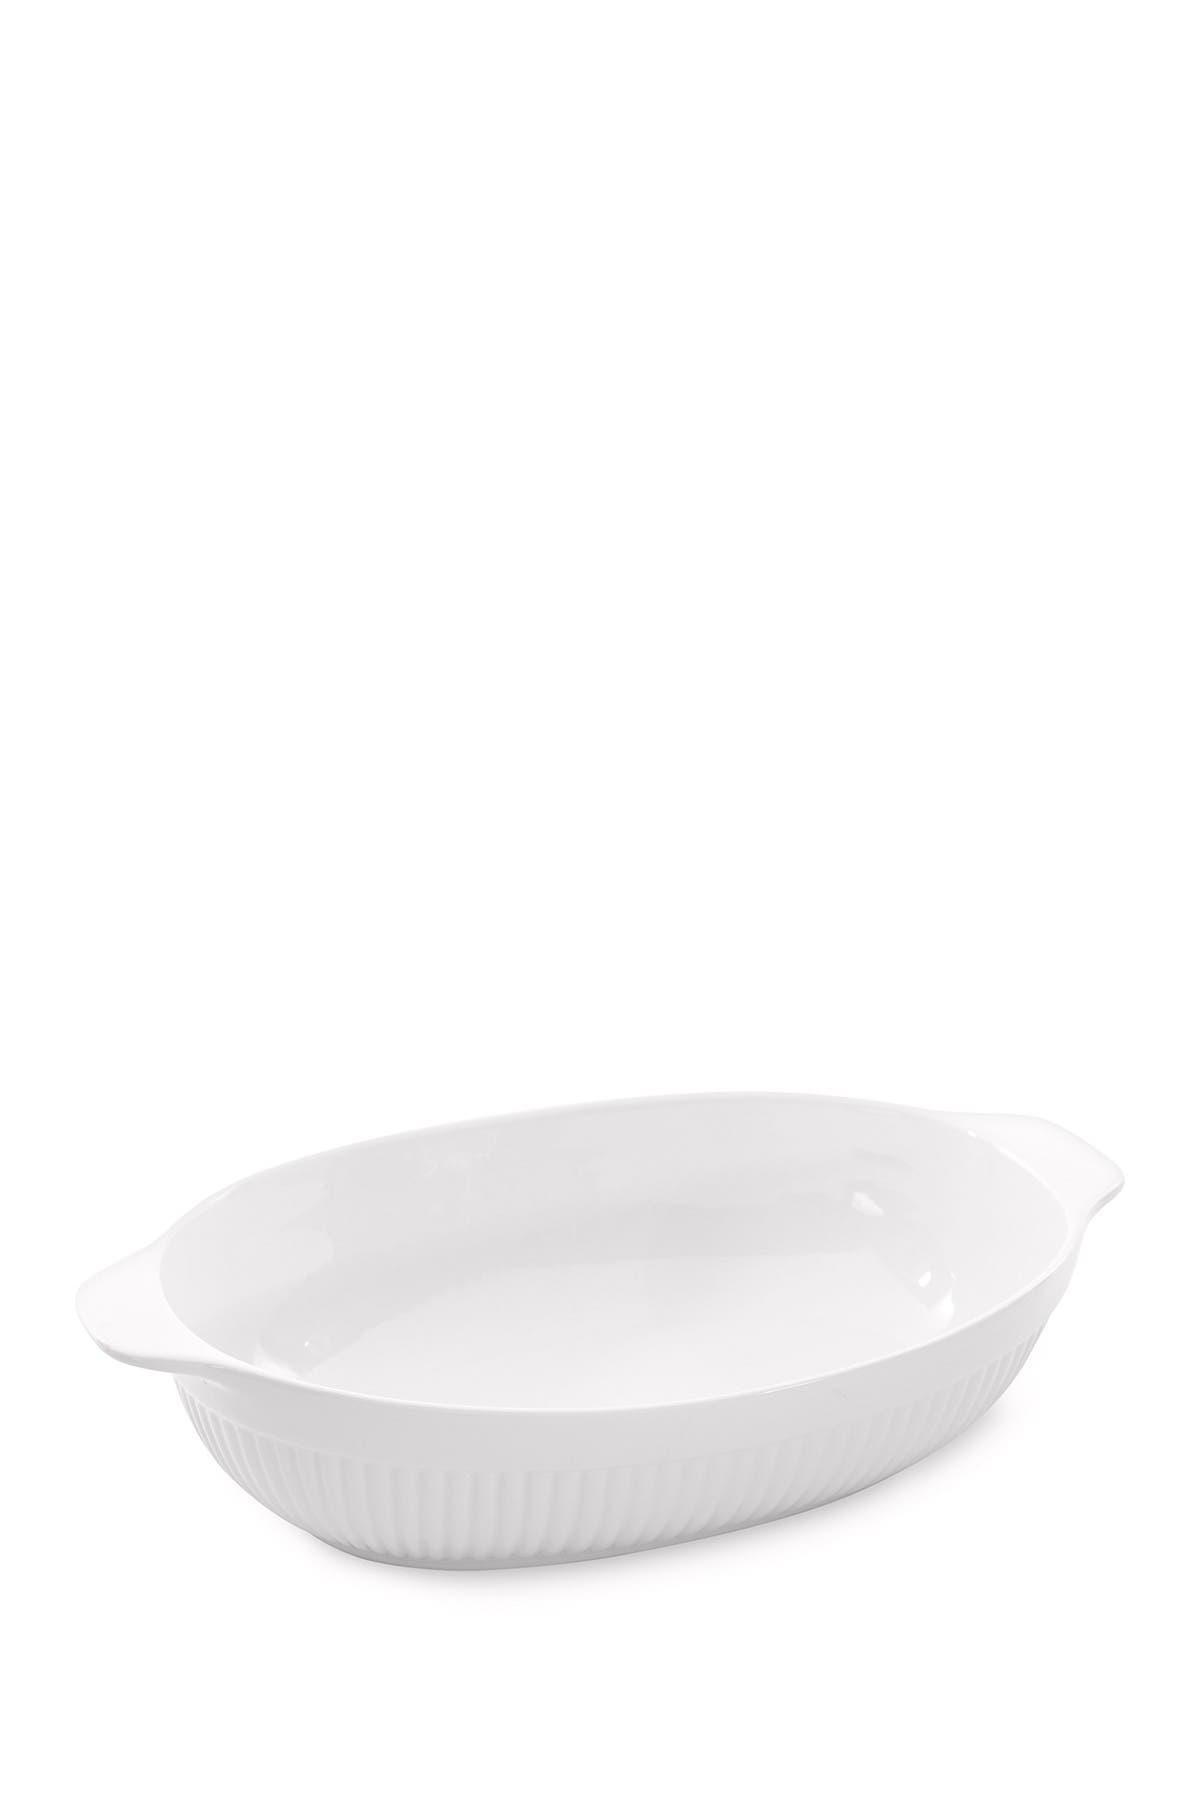 "Image of BergHOFF Bianco 11"" Oval Baking Dish"